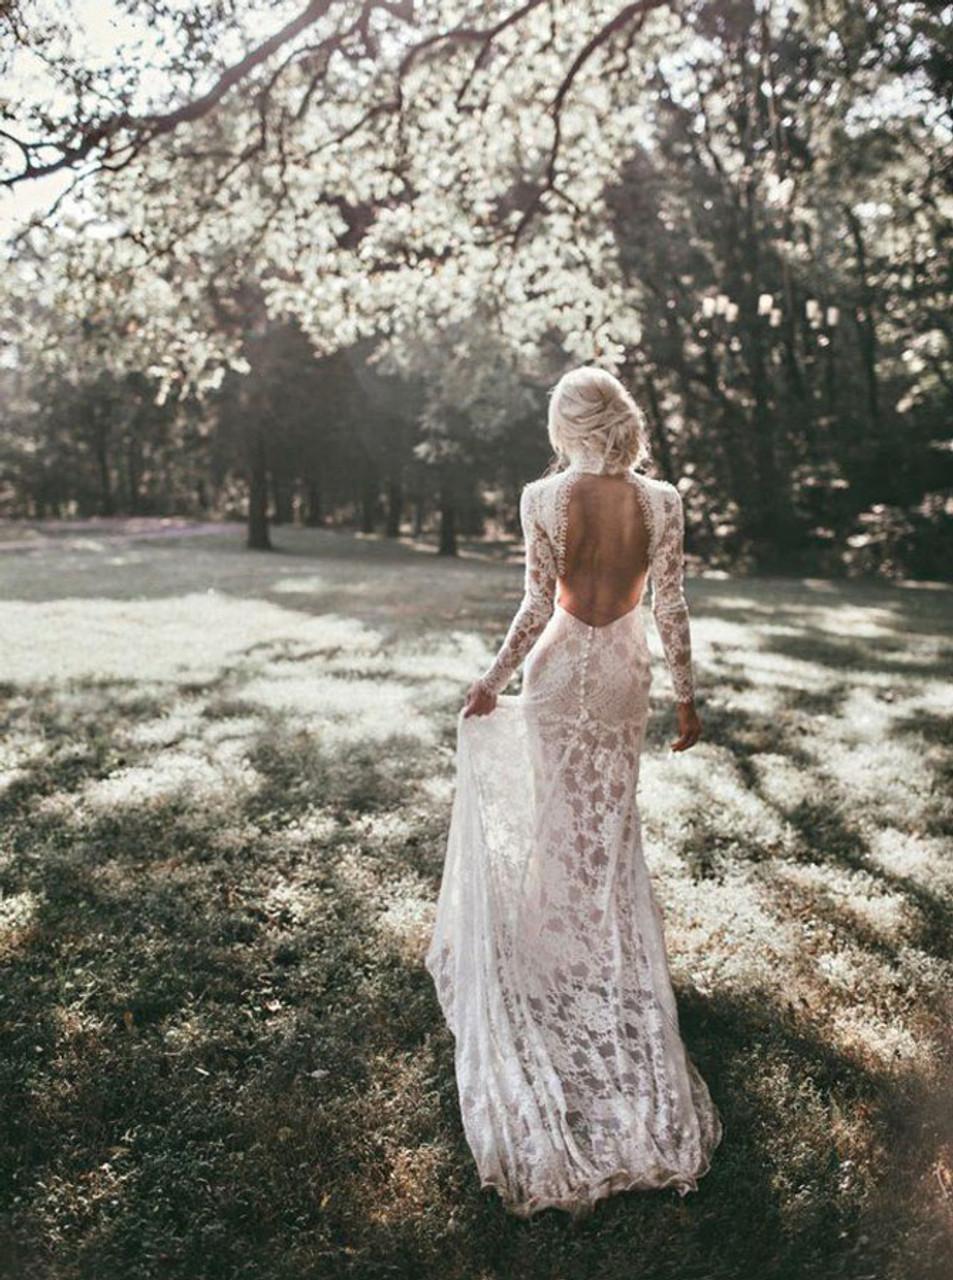 Vintage Wedding Dress Open Back Lace Fitted Wedding Dress High Neck Wedding Dress 12032 Landress Co Uk,Wedding Dresses Toronto Plus Size